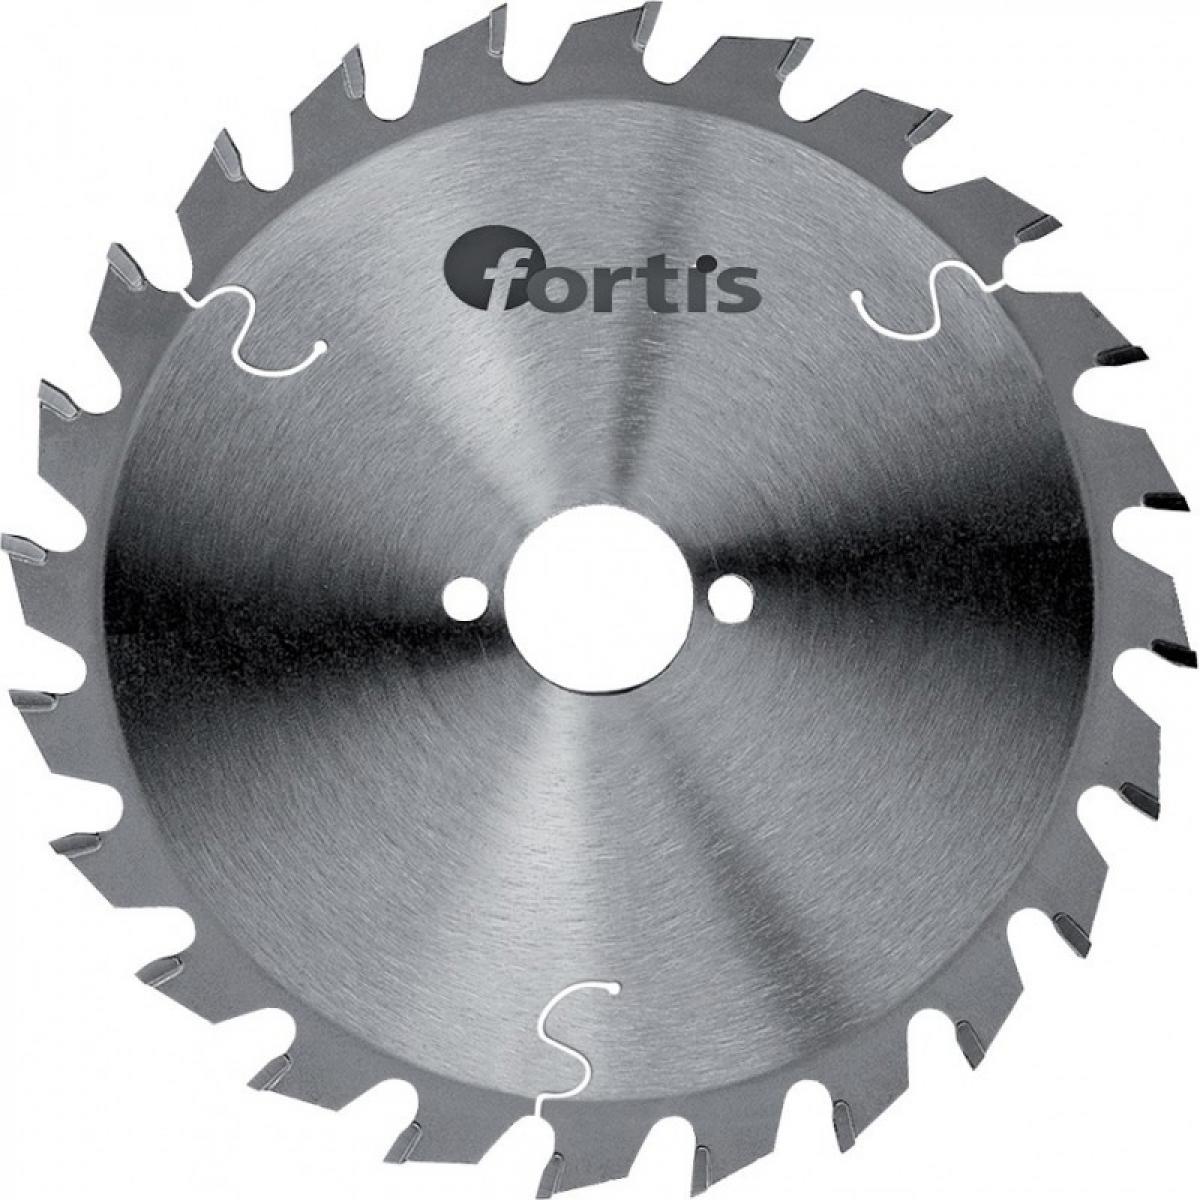 Fortis HW-Lame scie 160x2,4 x20mm Z20W Fortis